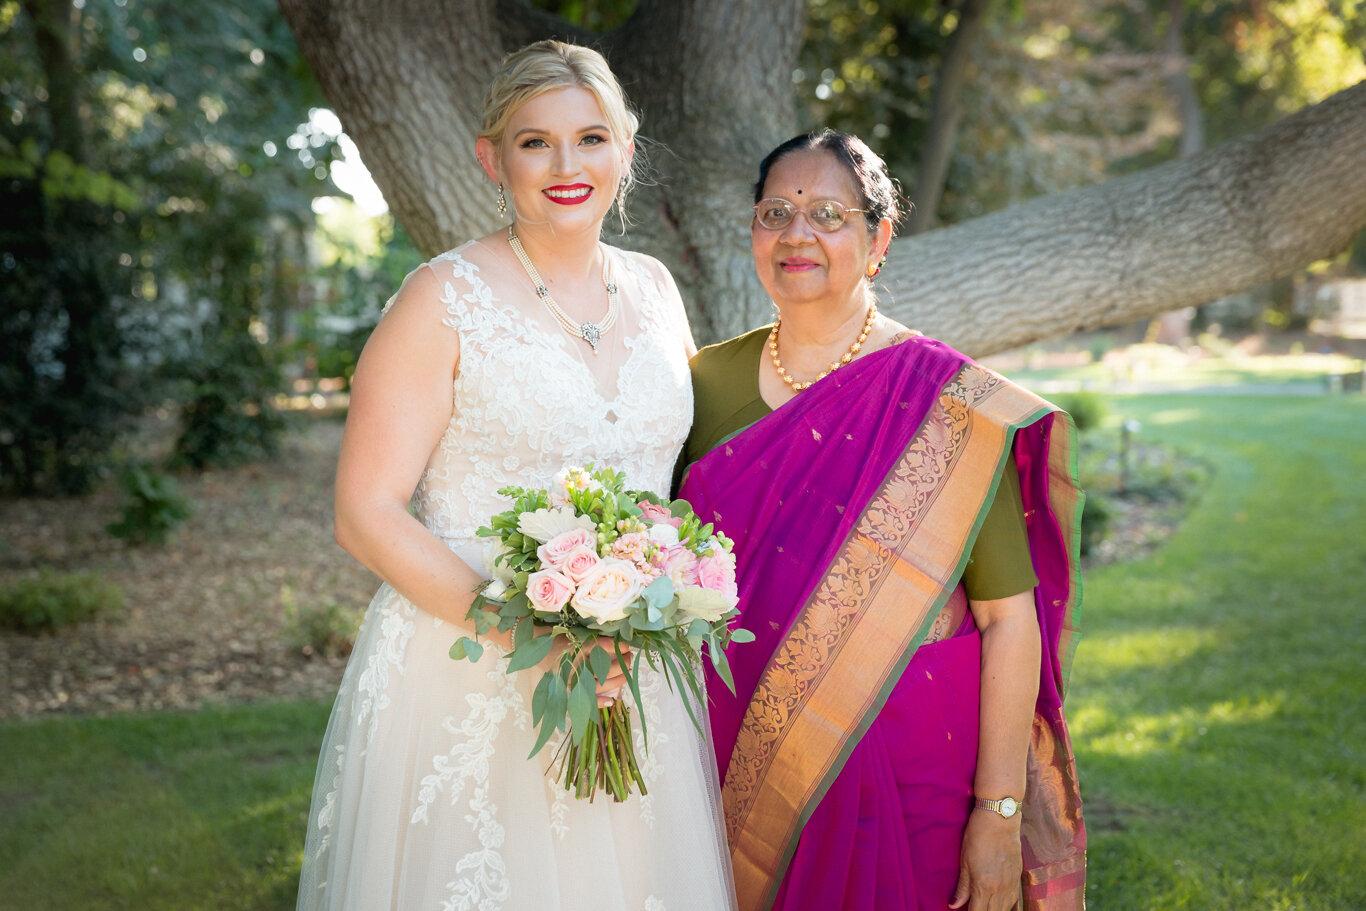 2019.08.24_Emily-Ashir-Wedding-at-the-Maples-5993.jpg